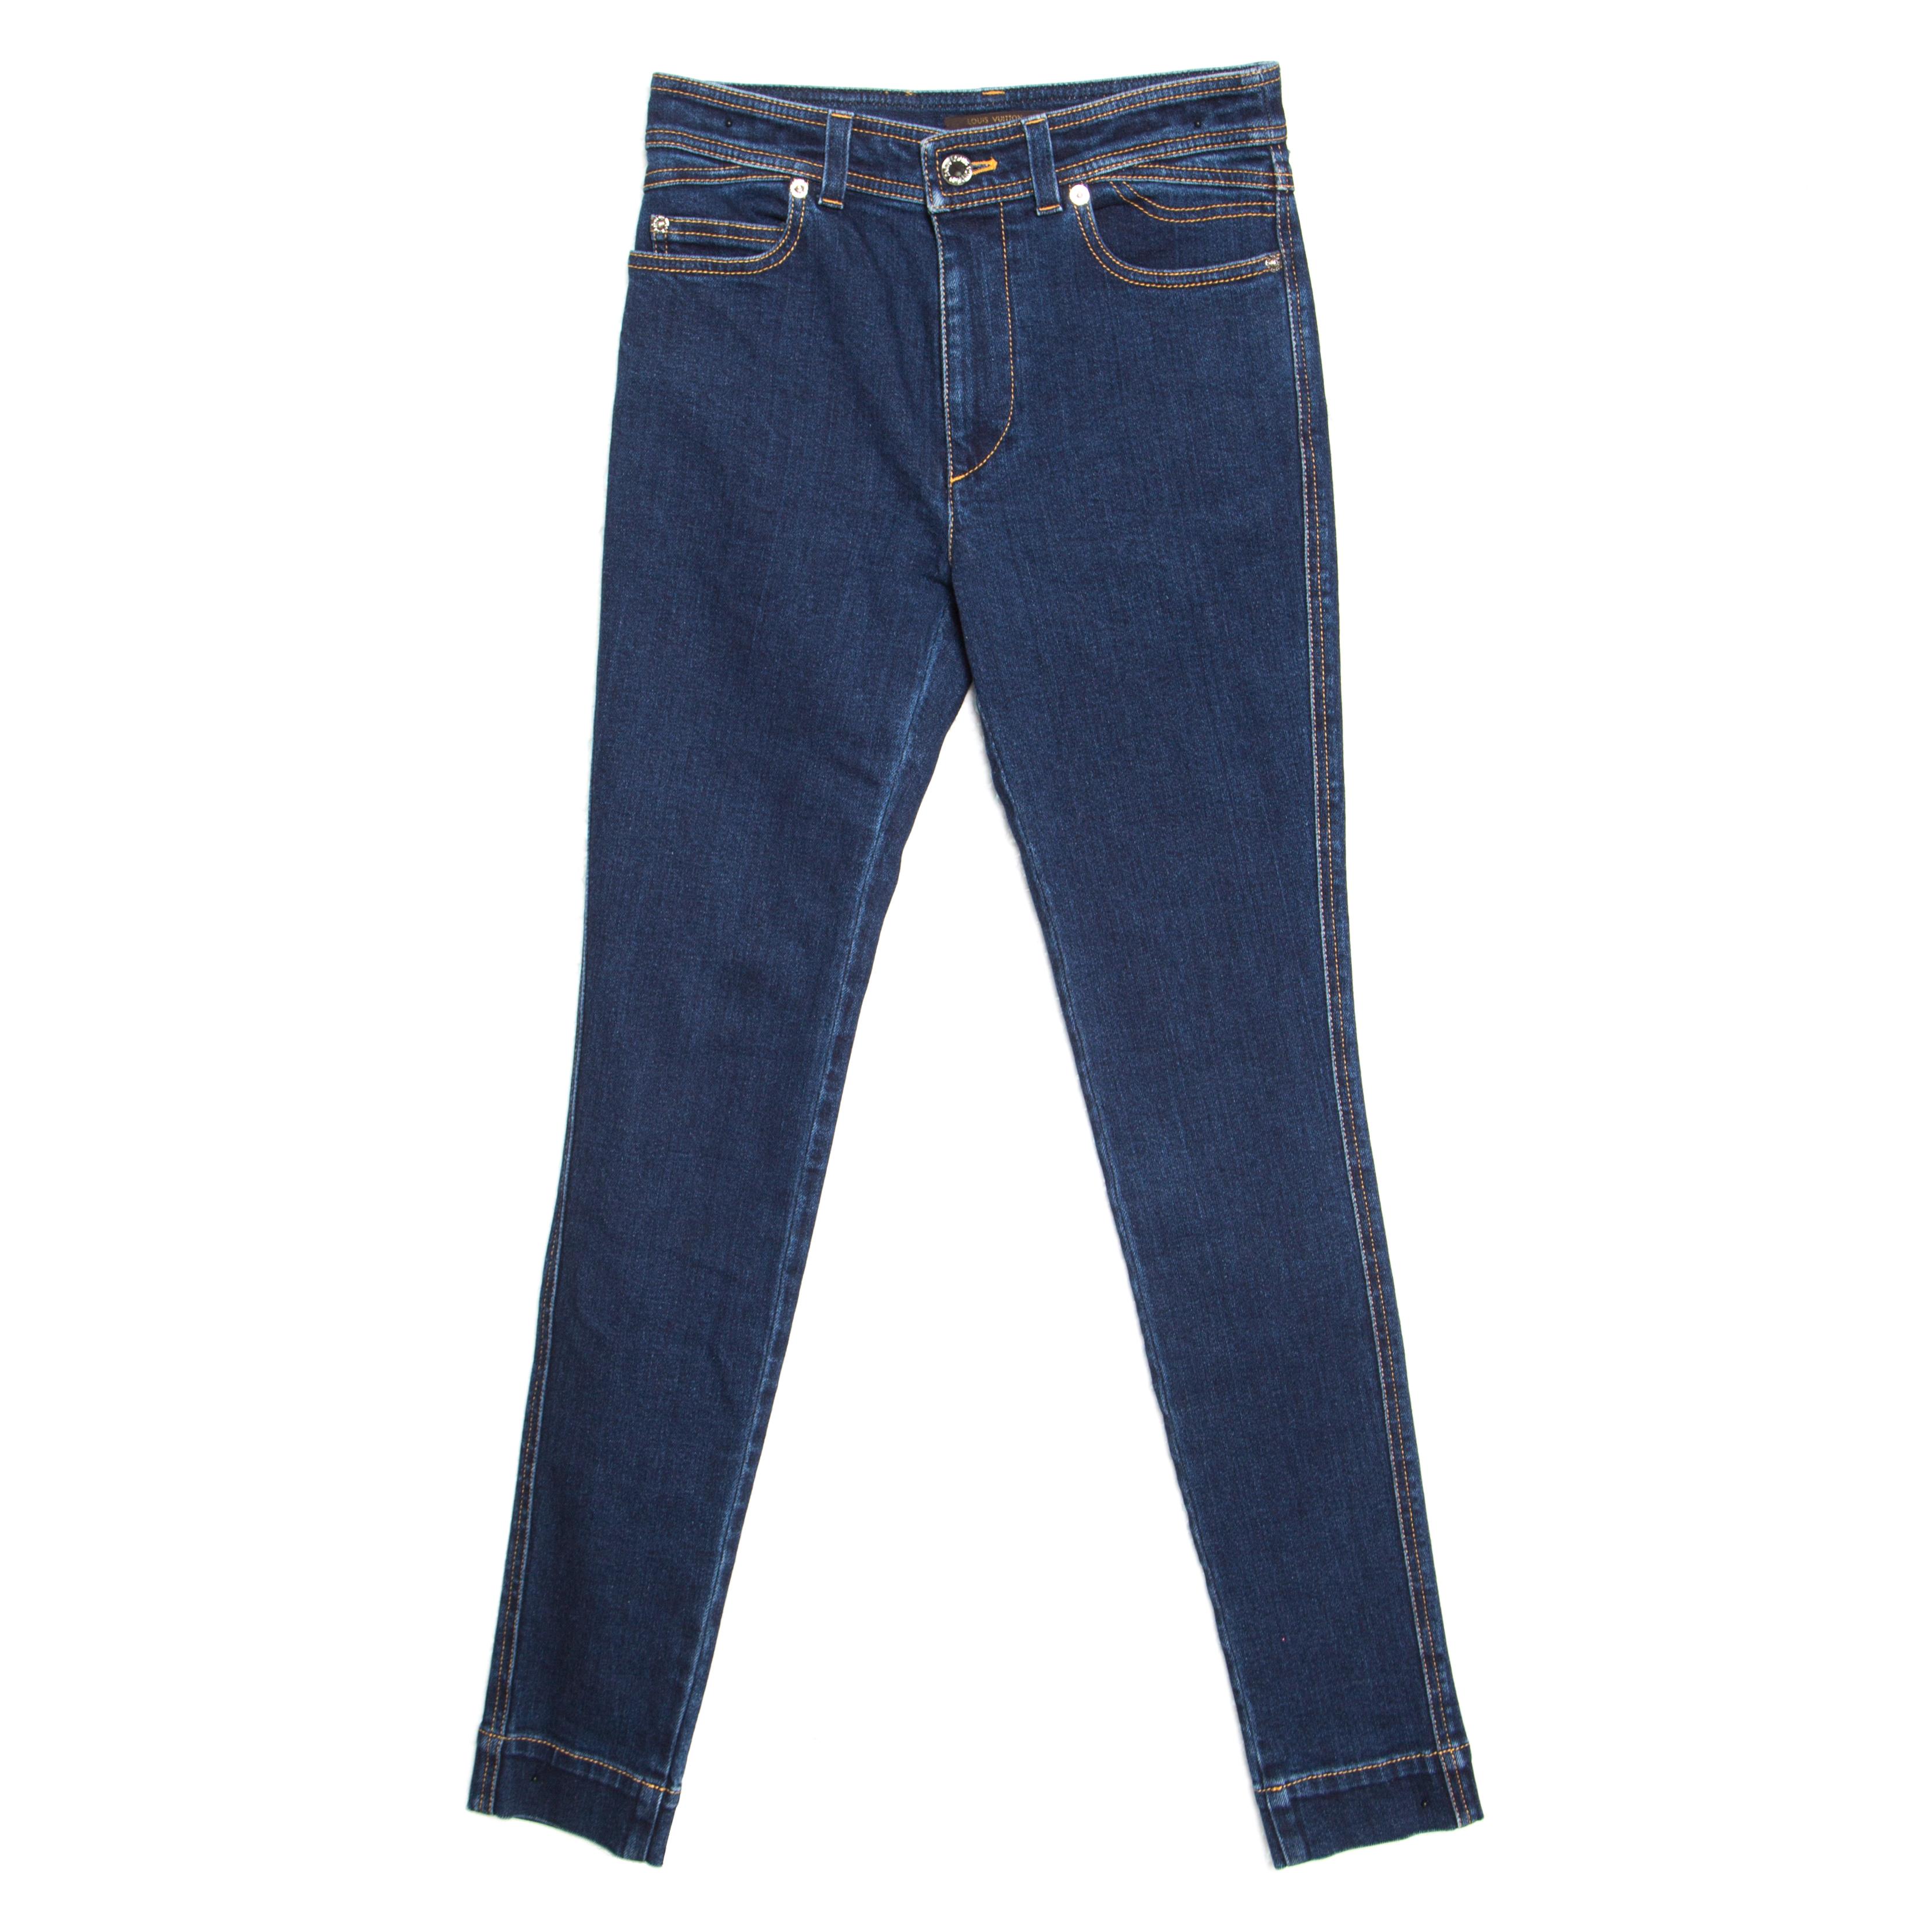 Купить со скидкой Louis Vuitton Indigo Dark Wash Denim Skinny Jeans S